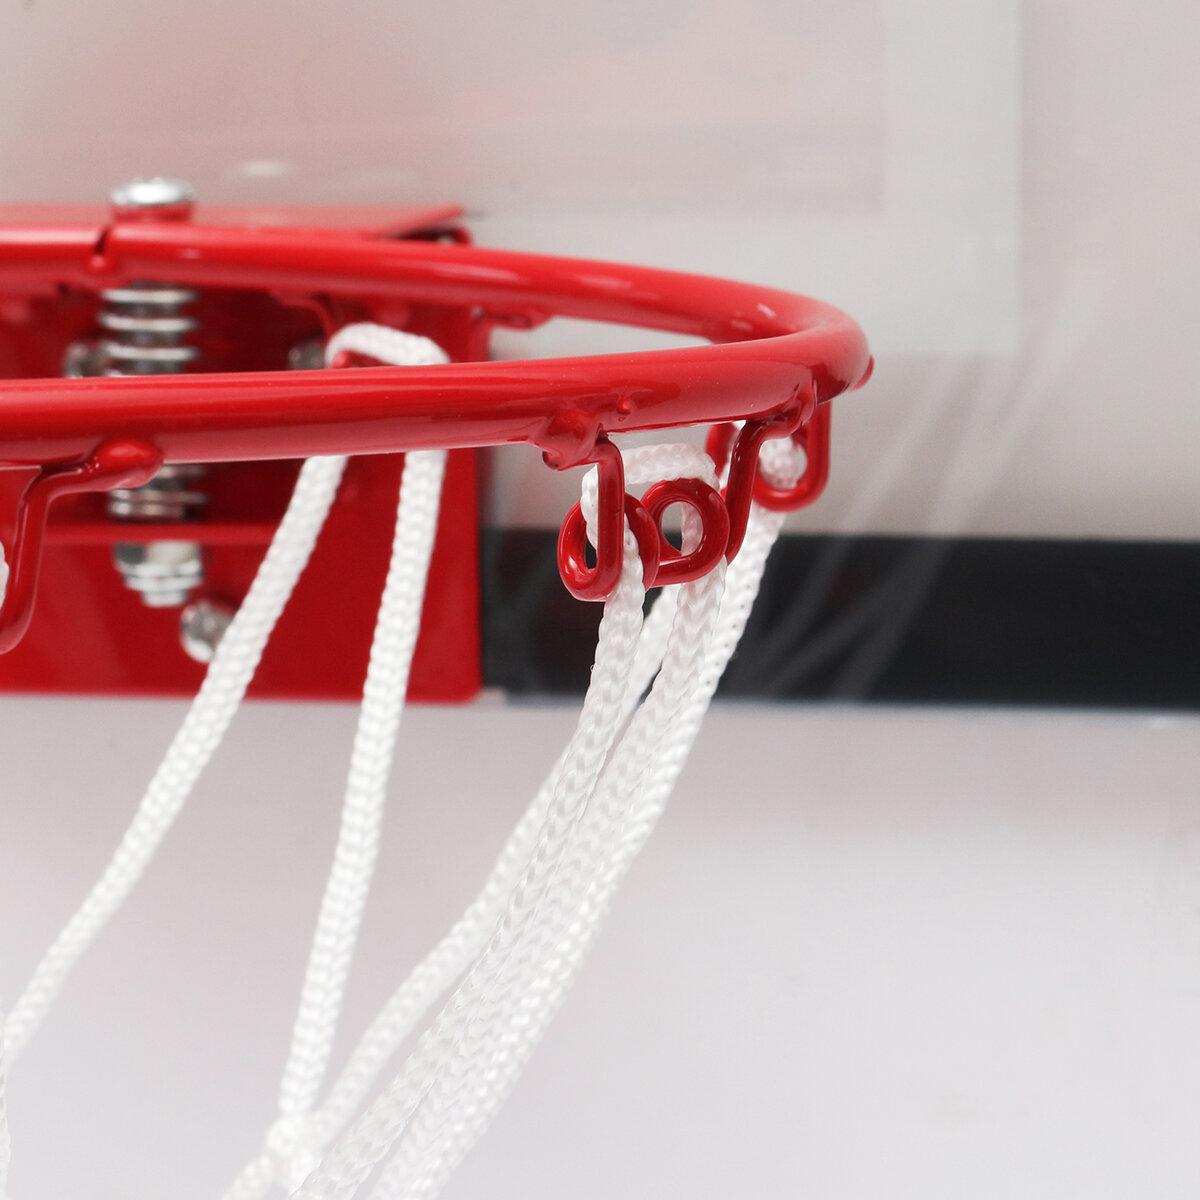 MiniBasketballSetIndoorNetHoop Met Ball Pump Indoor Sporting Game Goods - 6